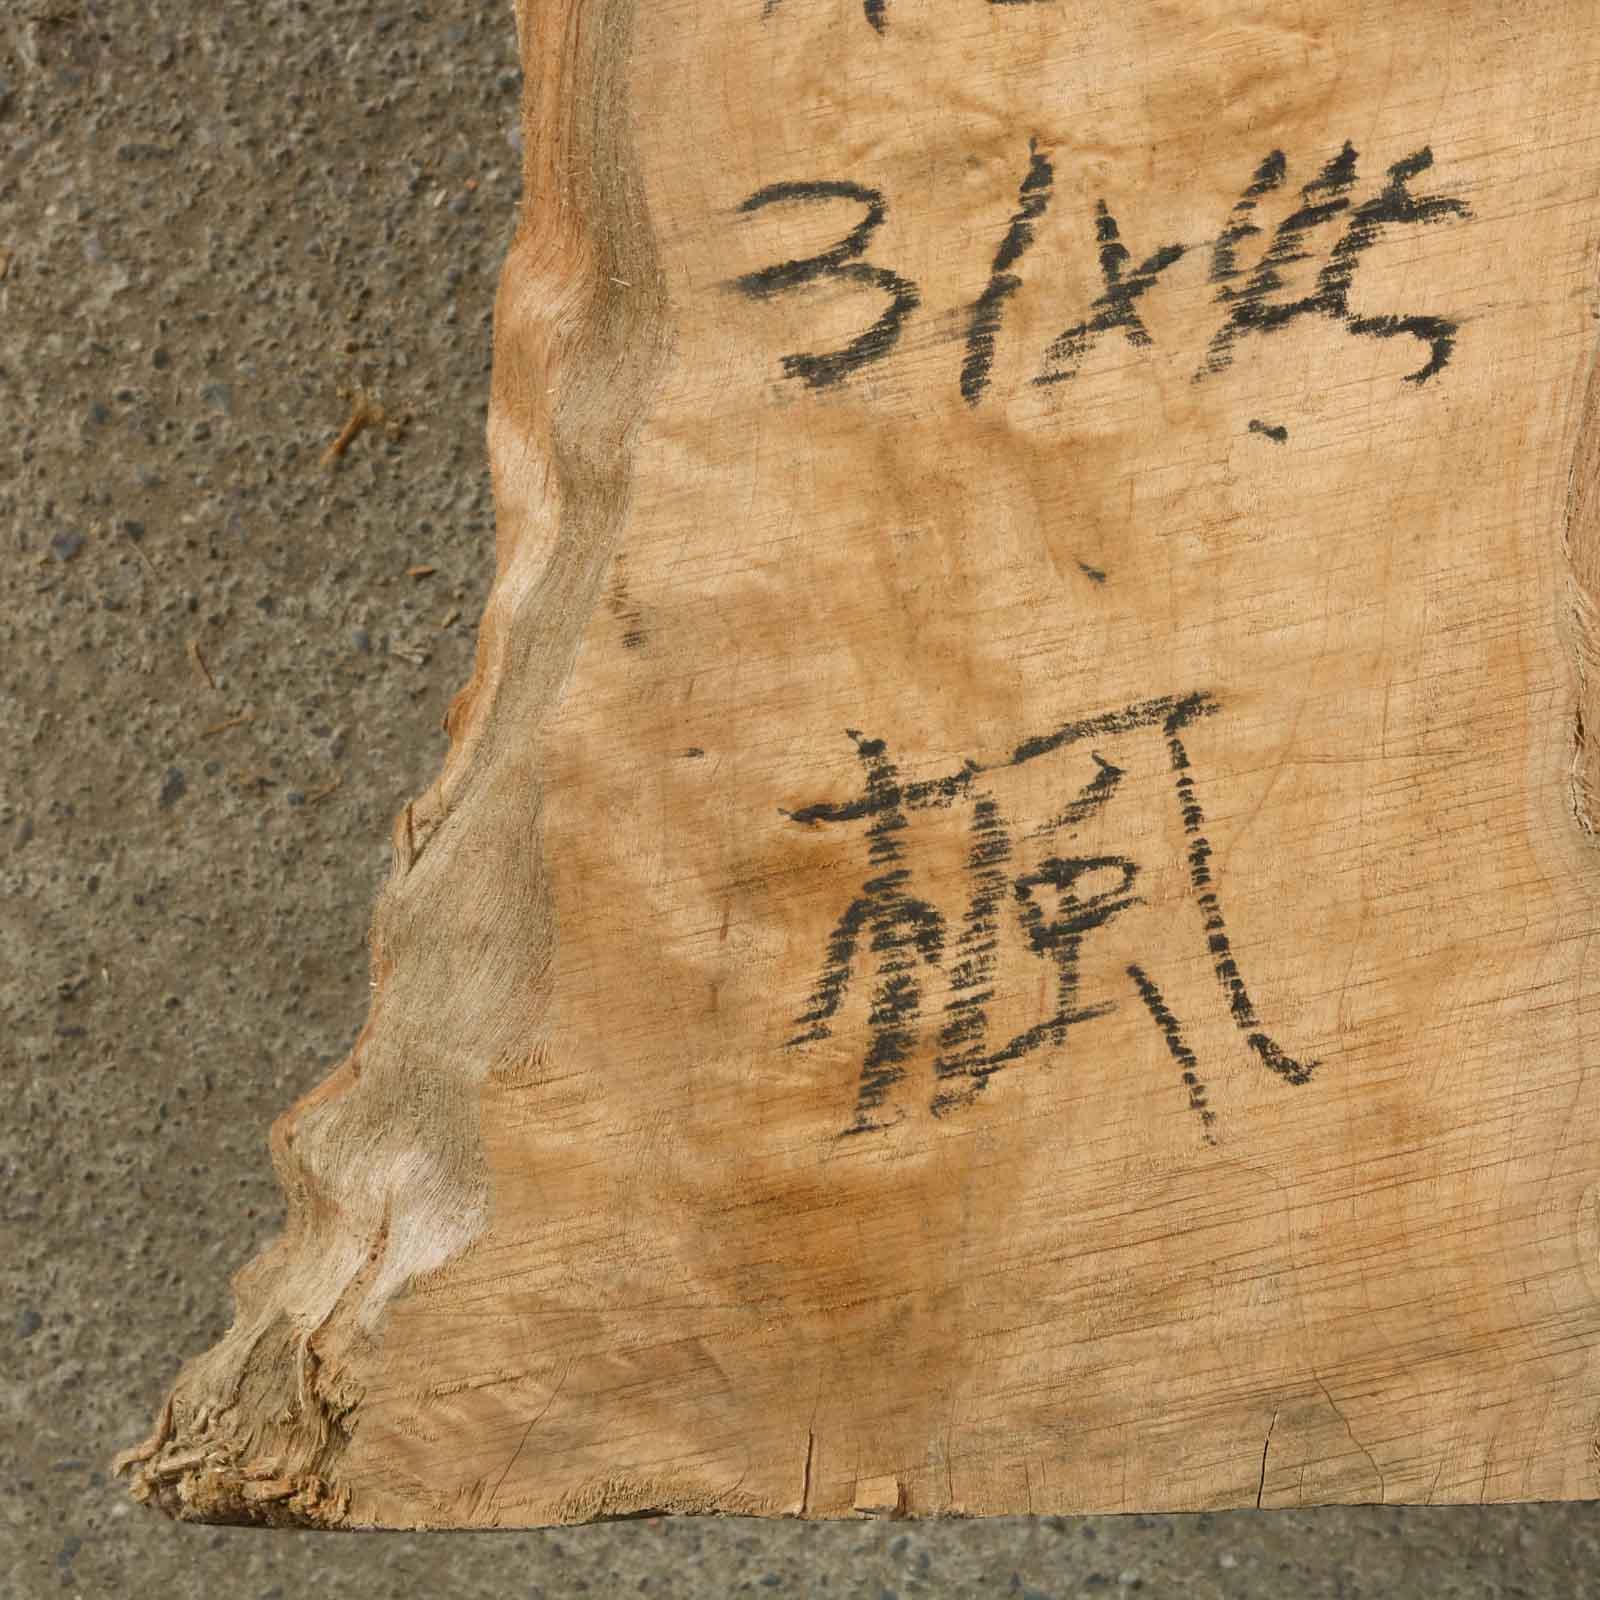 18-023 楓 (カエデ) 一枚板 梶本銘木店(江東区)